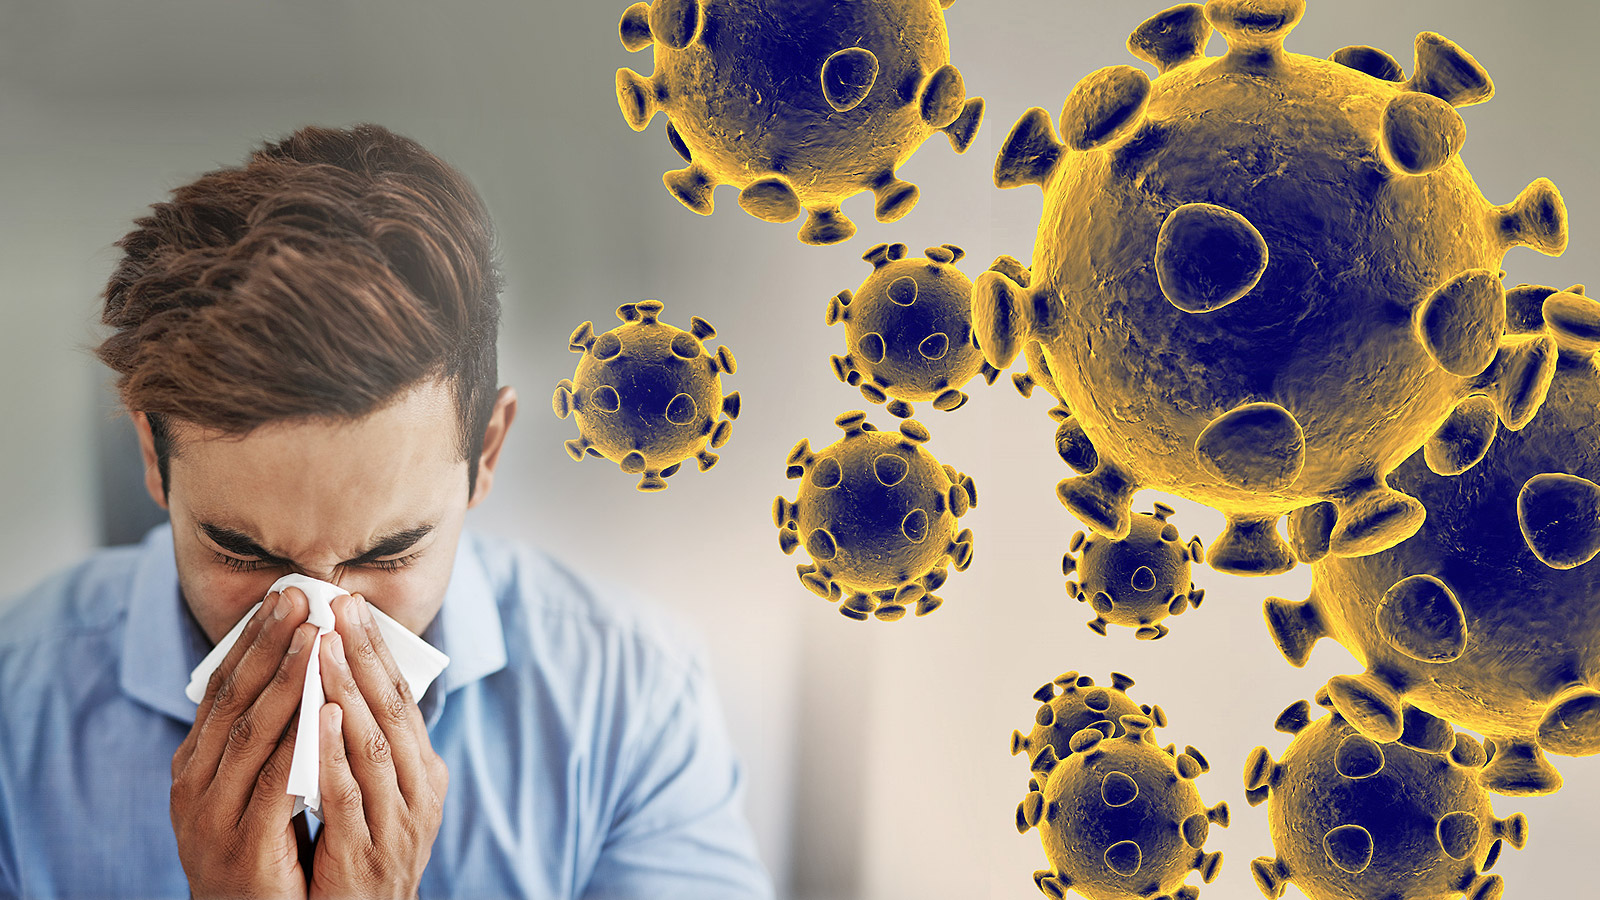 guy coughing with coronavirus spores around him